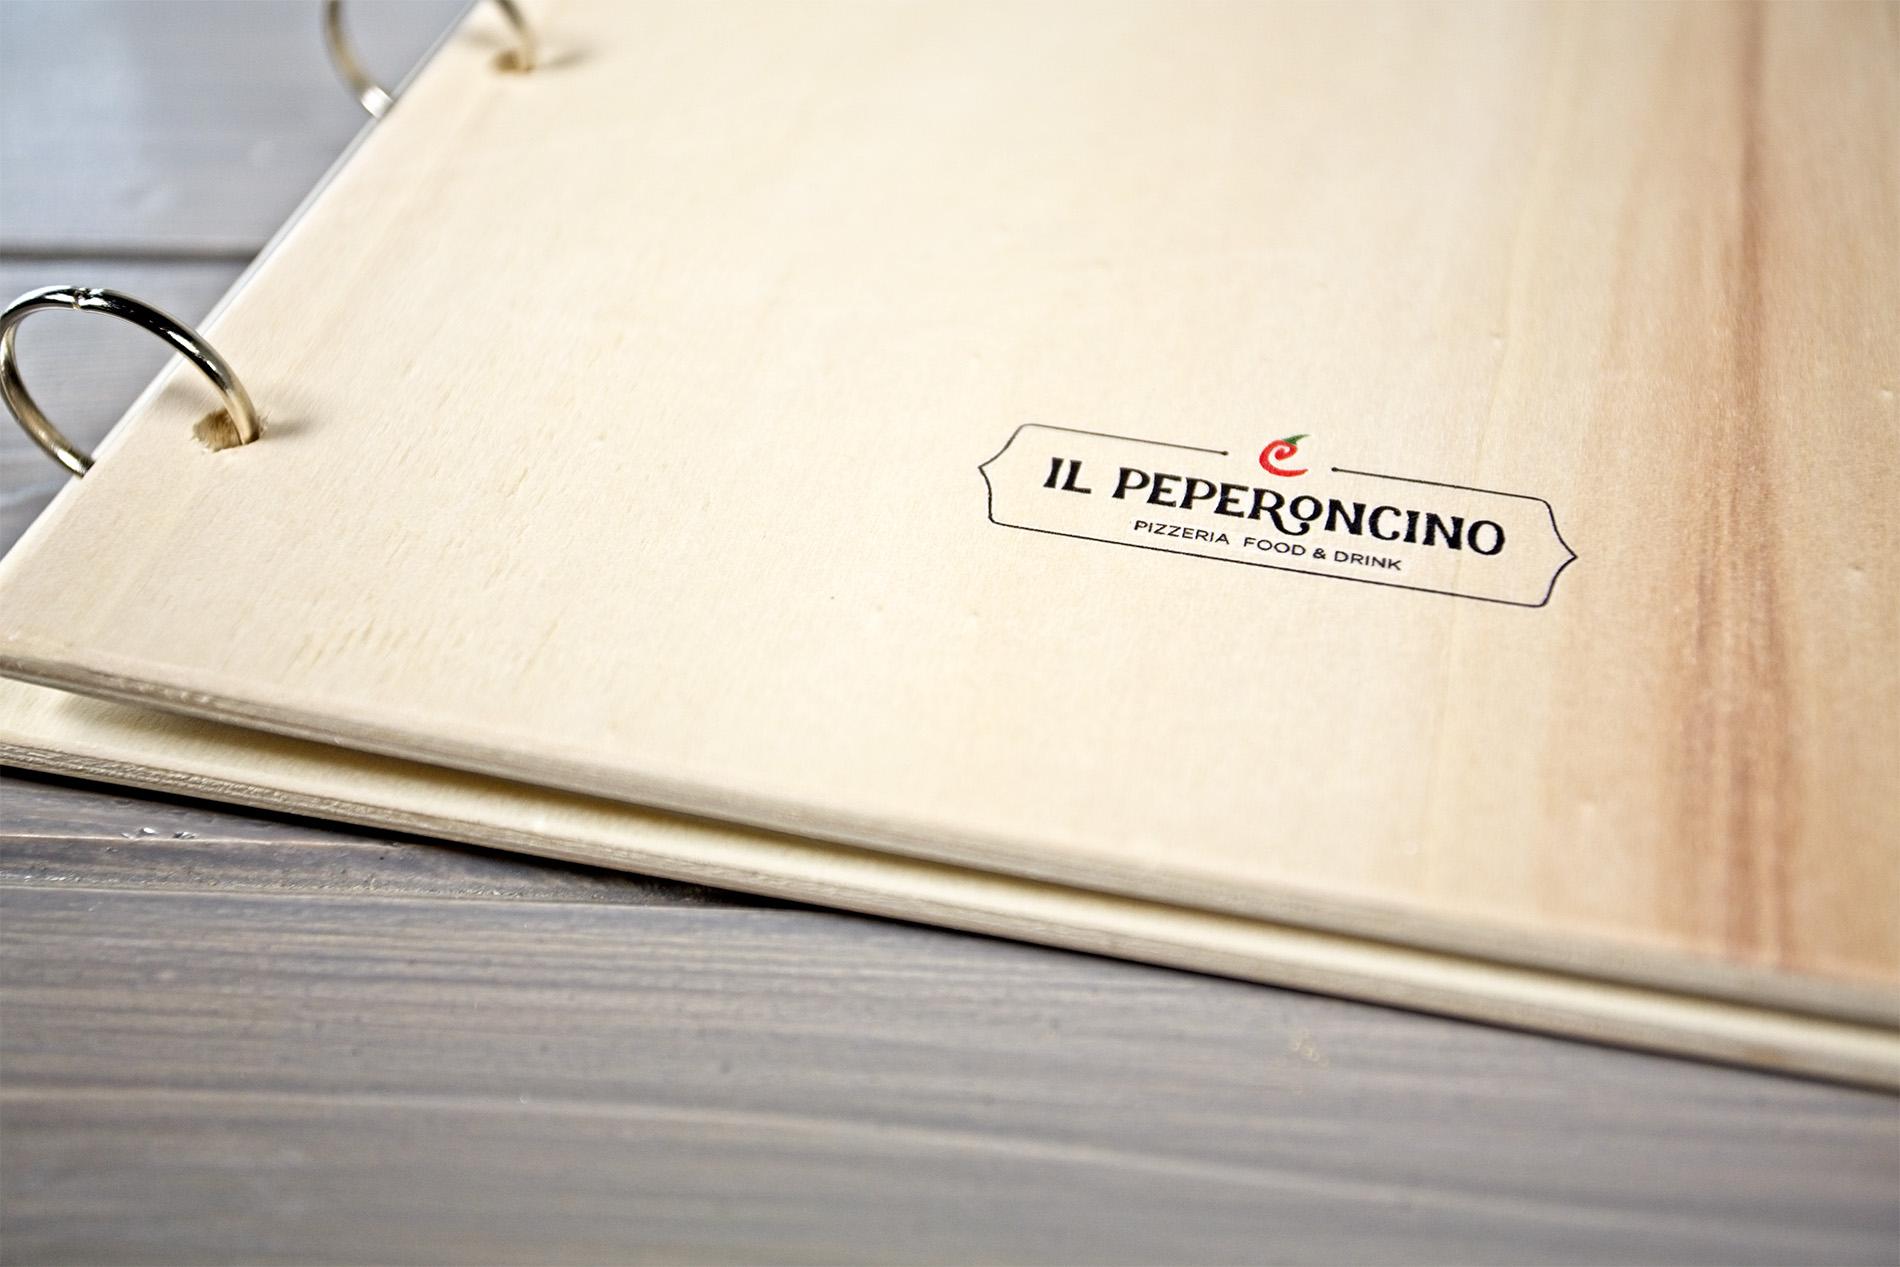 Portamenu Sperone Particolare Logo Il Peperoncino